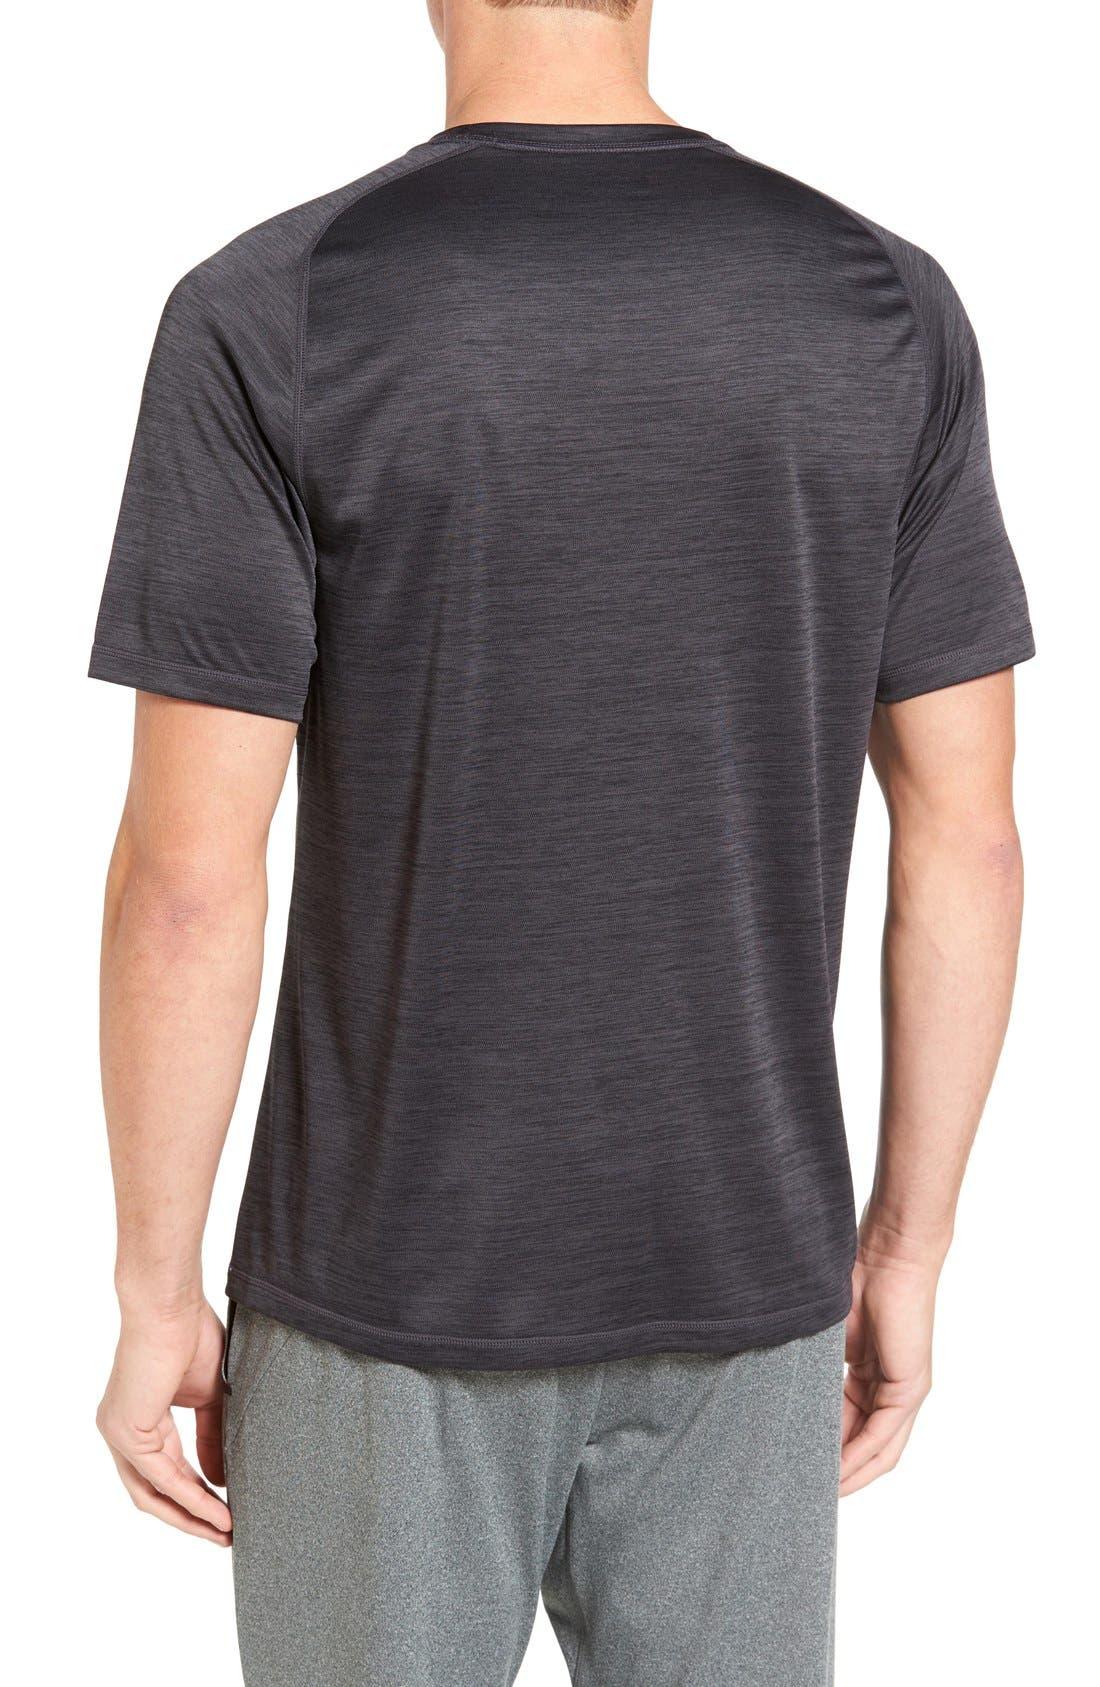 Triplite T-Shirt,                             Alternate thumbnail 17, color,